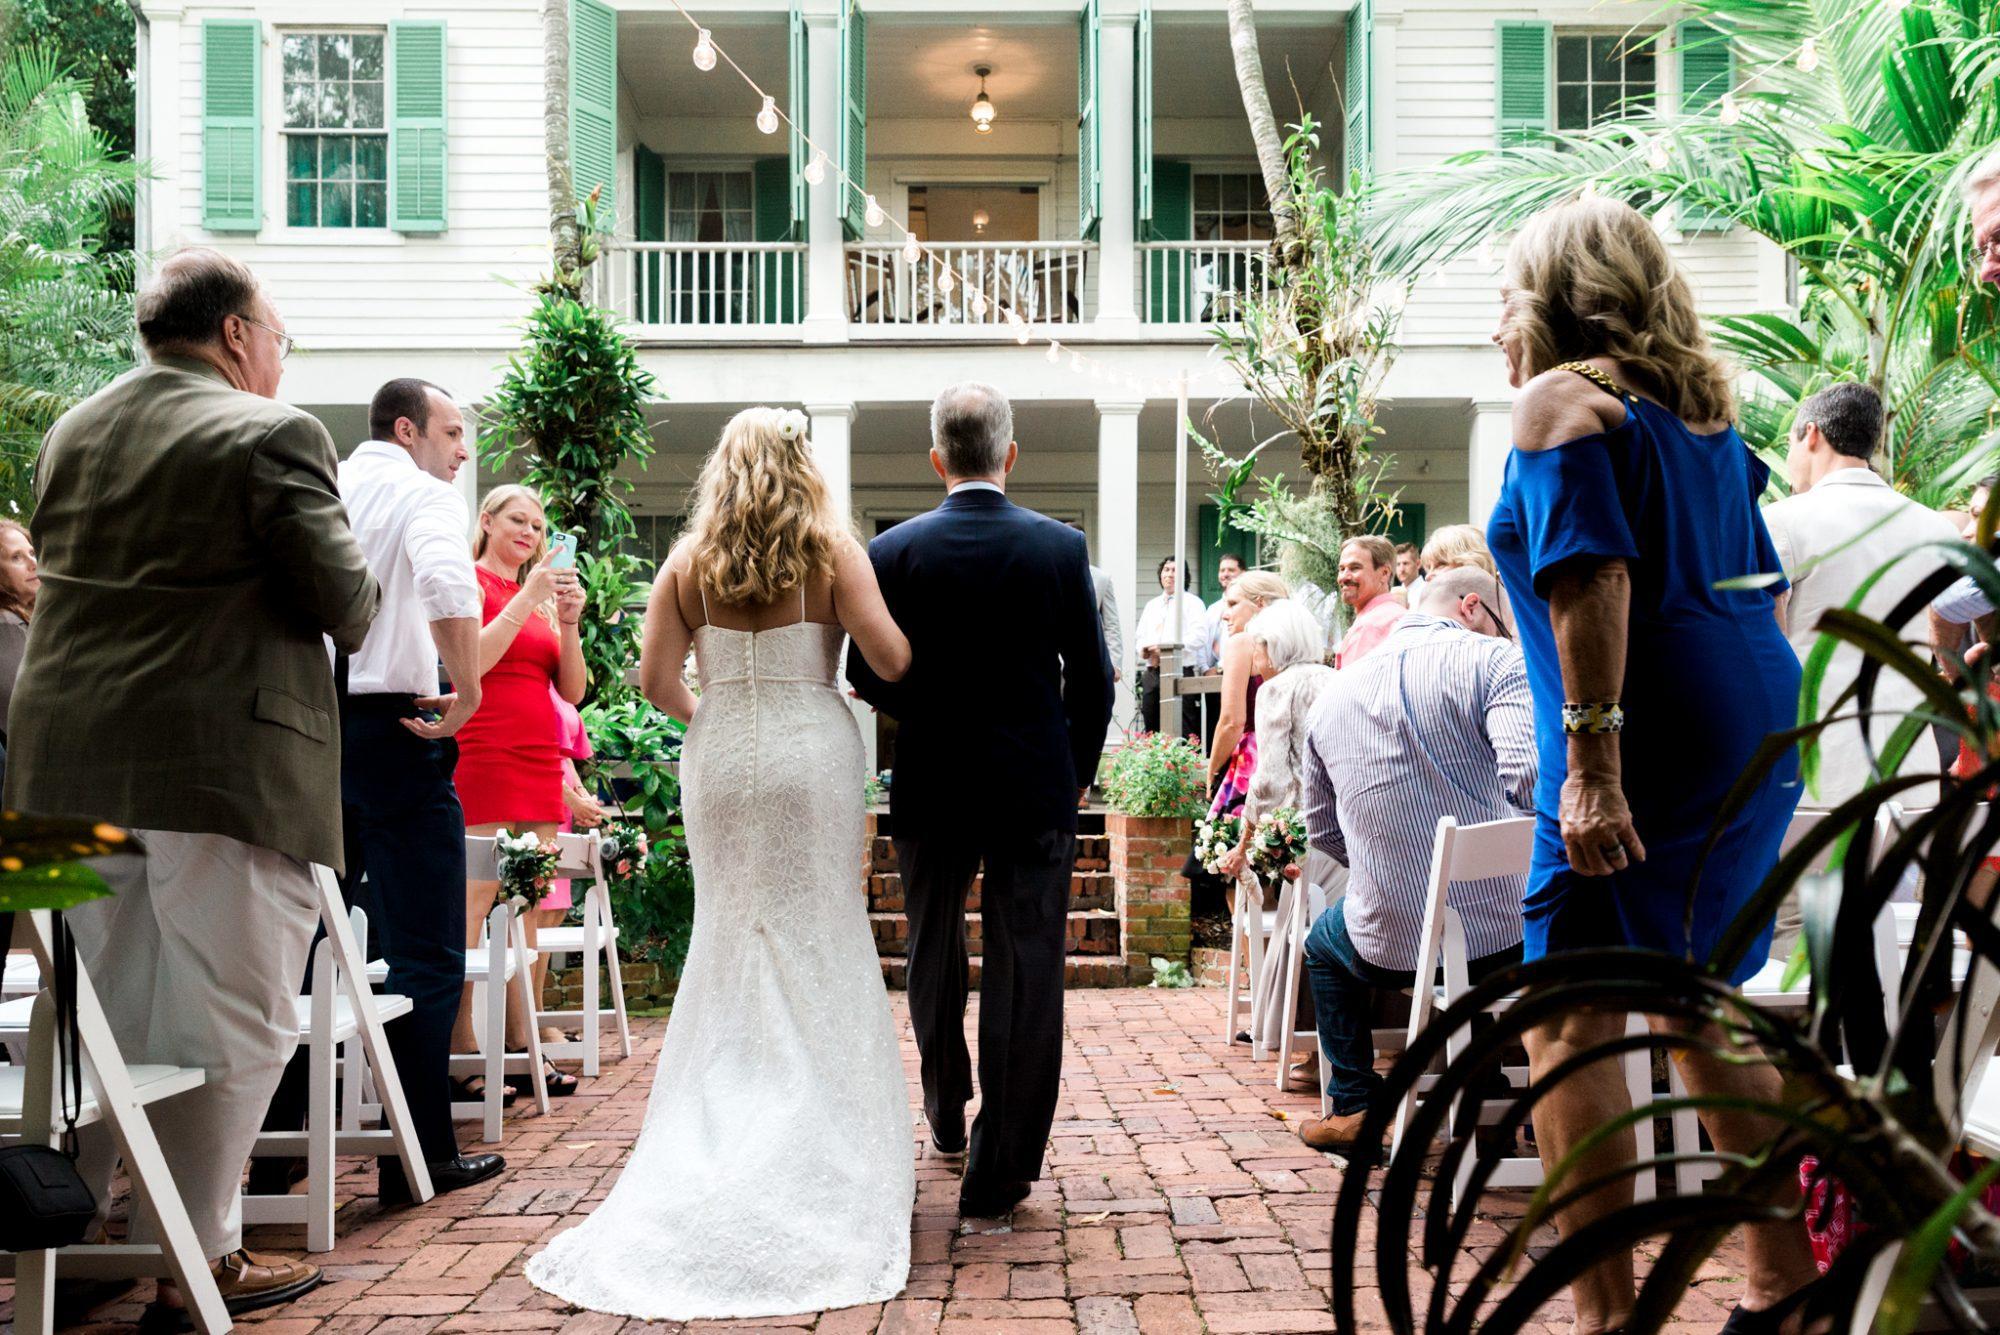 colleen-jonathan-audubon-house-wedding-key-west-45